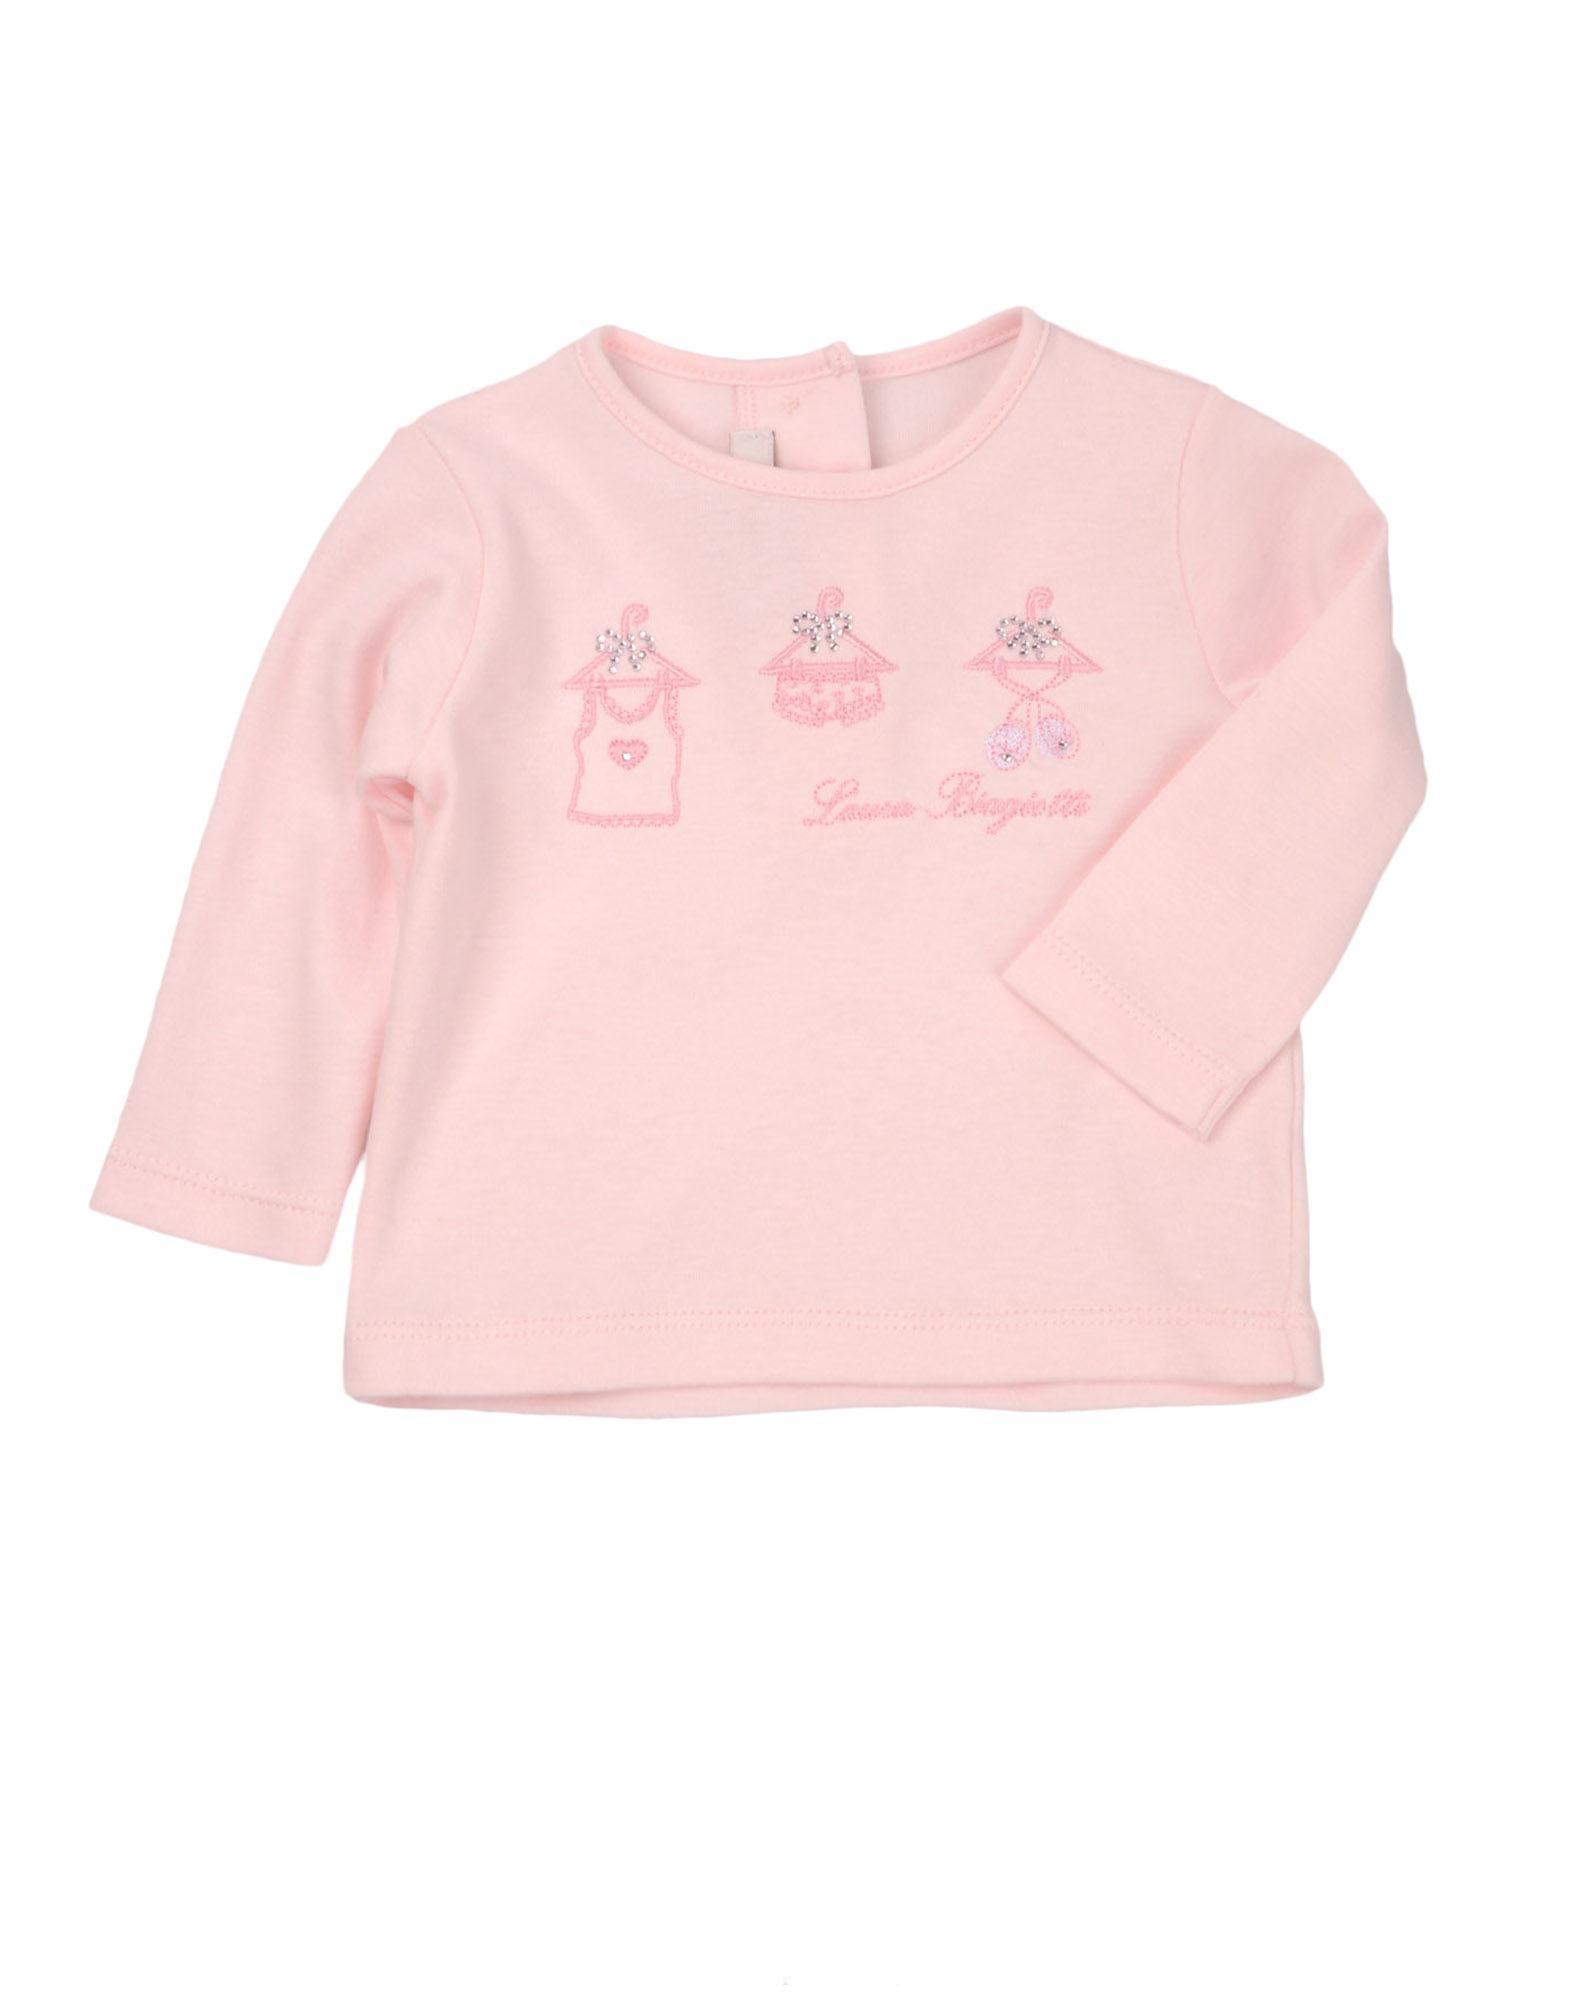 LAURA BIAGIOTTI BABY Mädchen 0-24 monate Langärmliges T-Shirt Farbe Rosa Größe 1